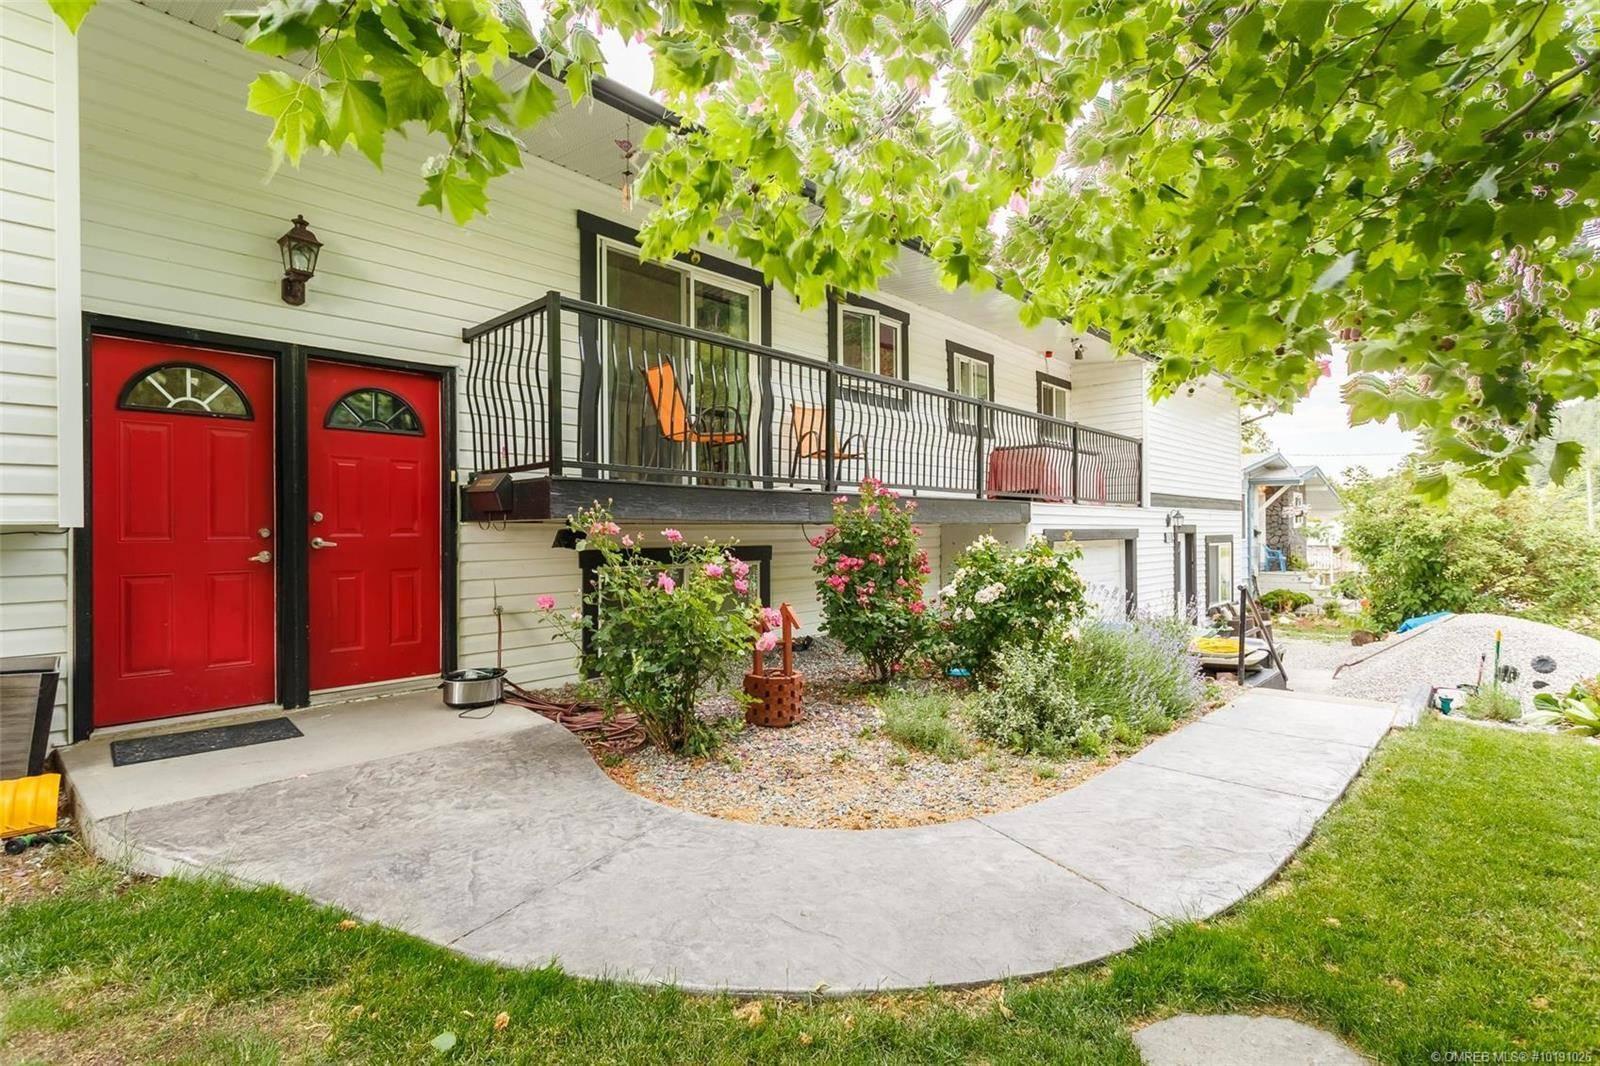 House for sale at 1560 Ponderosa Rd West Kelowna British Columbia - MLS: 10191026